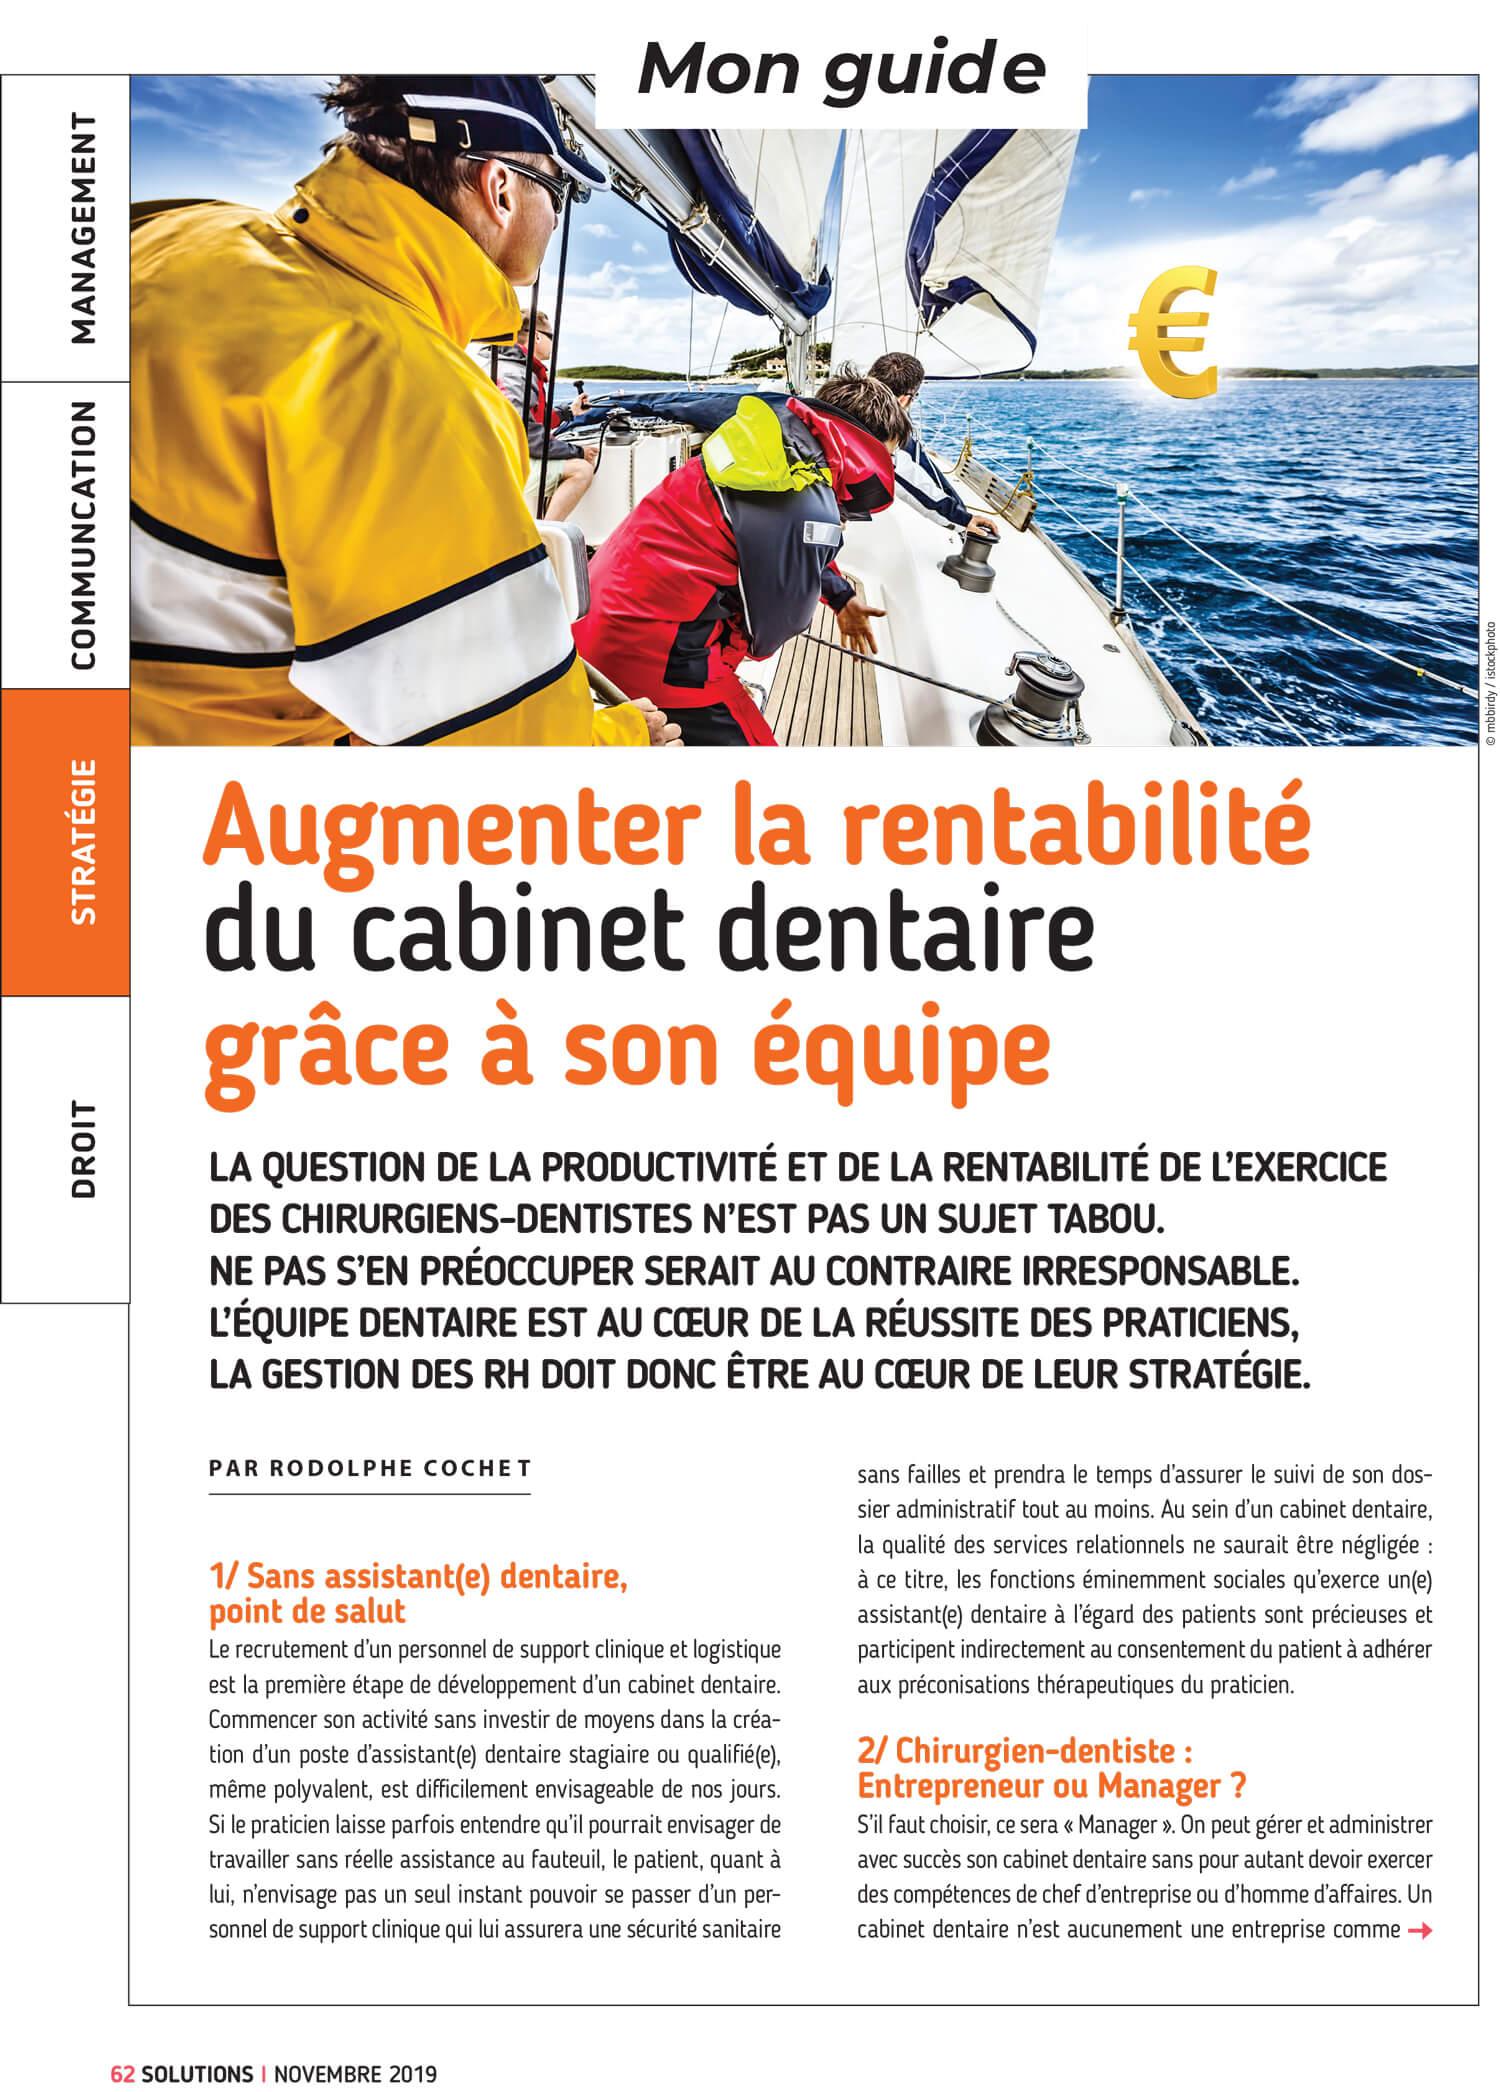 Augmenter_la_rentabilite_du_cabinet_dentaire_rodolphe_cochet_solutions_cabinet_dentaire.jpg